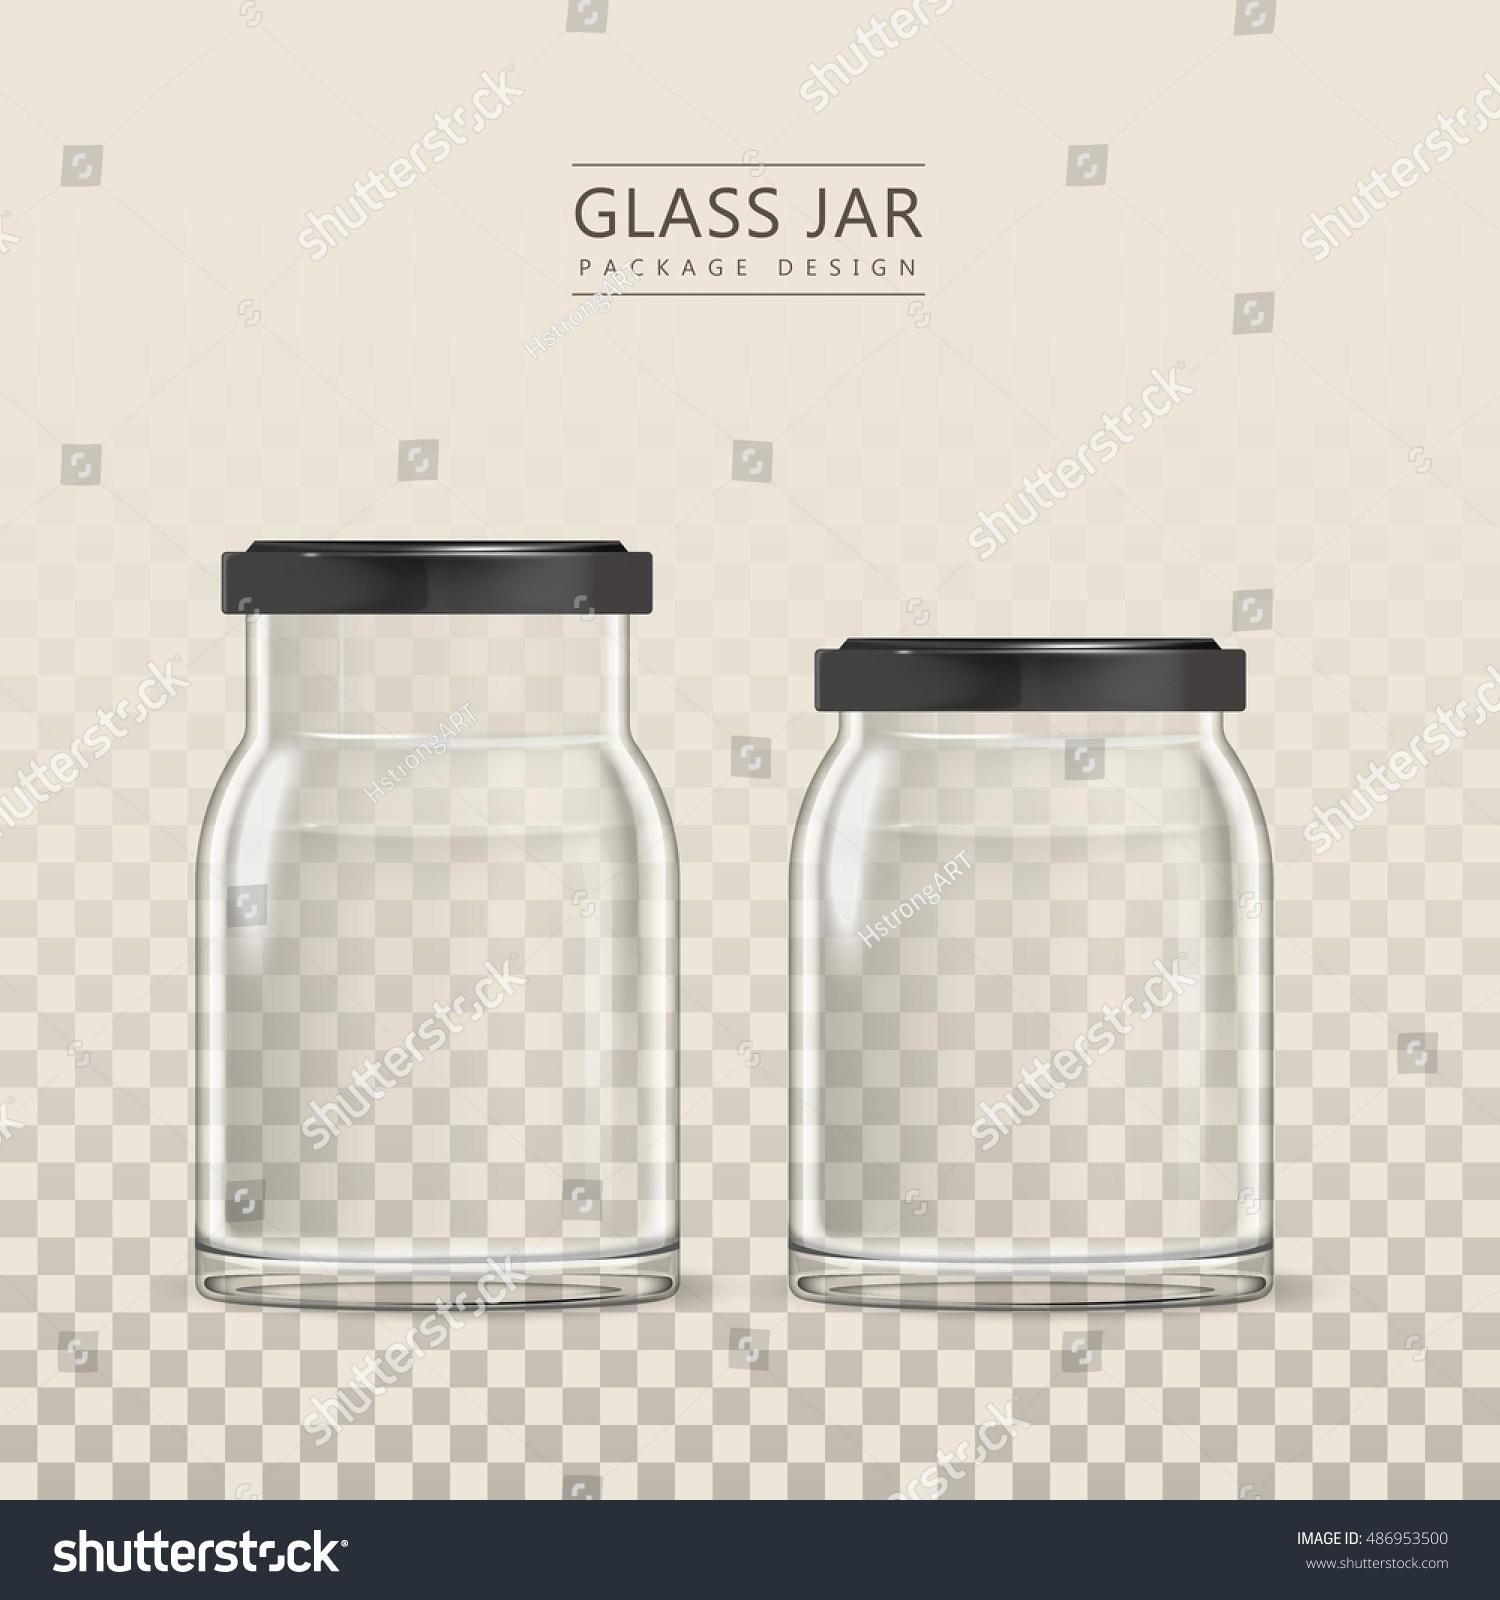 Empty Glass Jar Template 3 D Illustration Stock Vector (Royalty Free ...